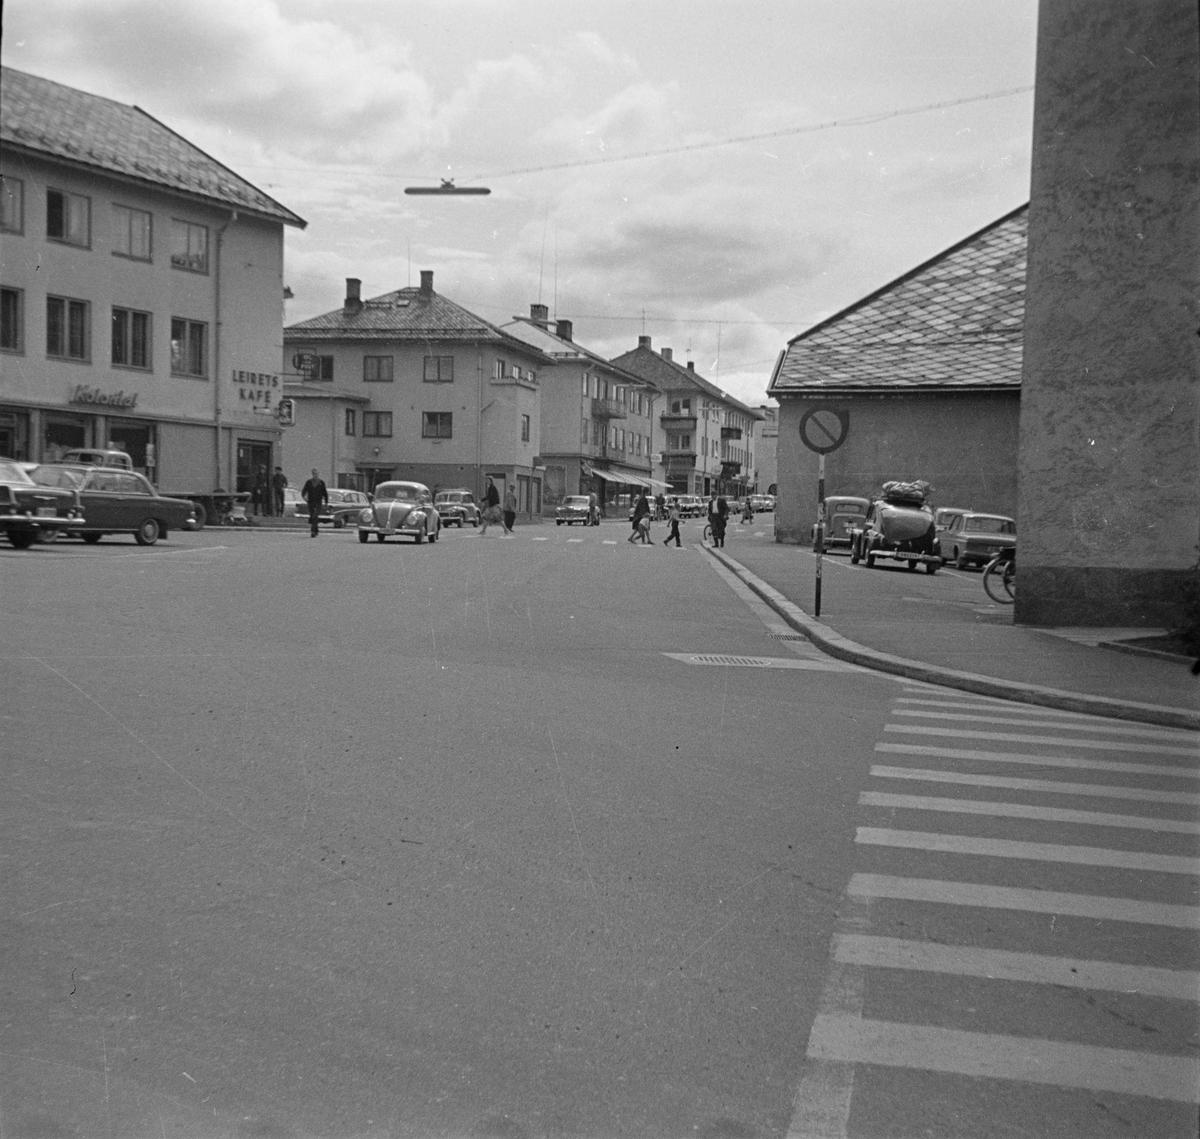 St. Olavs gate. Leiret, Elverum.